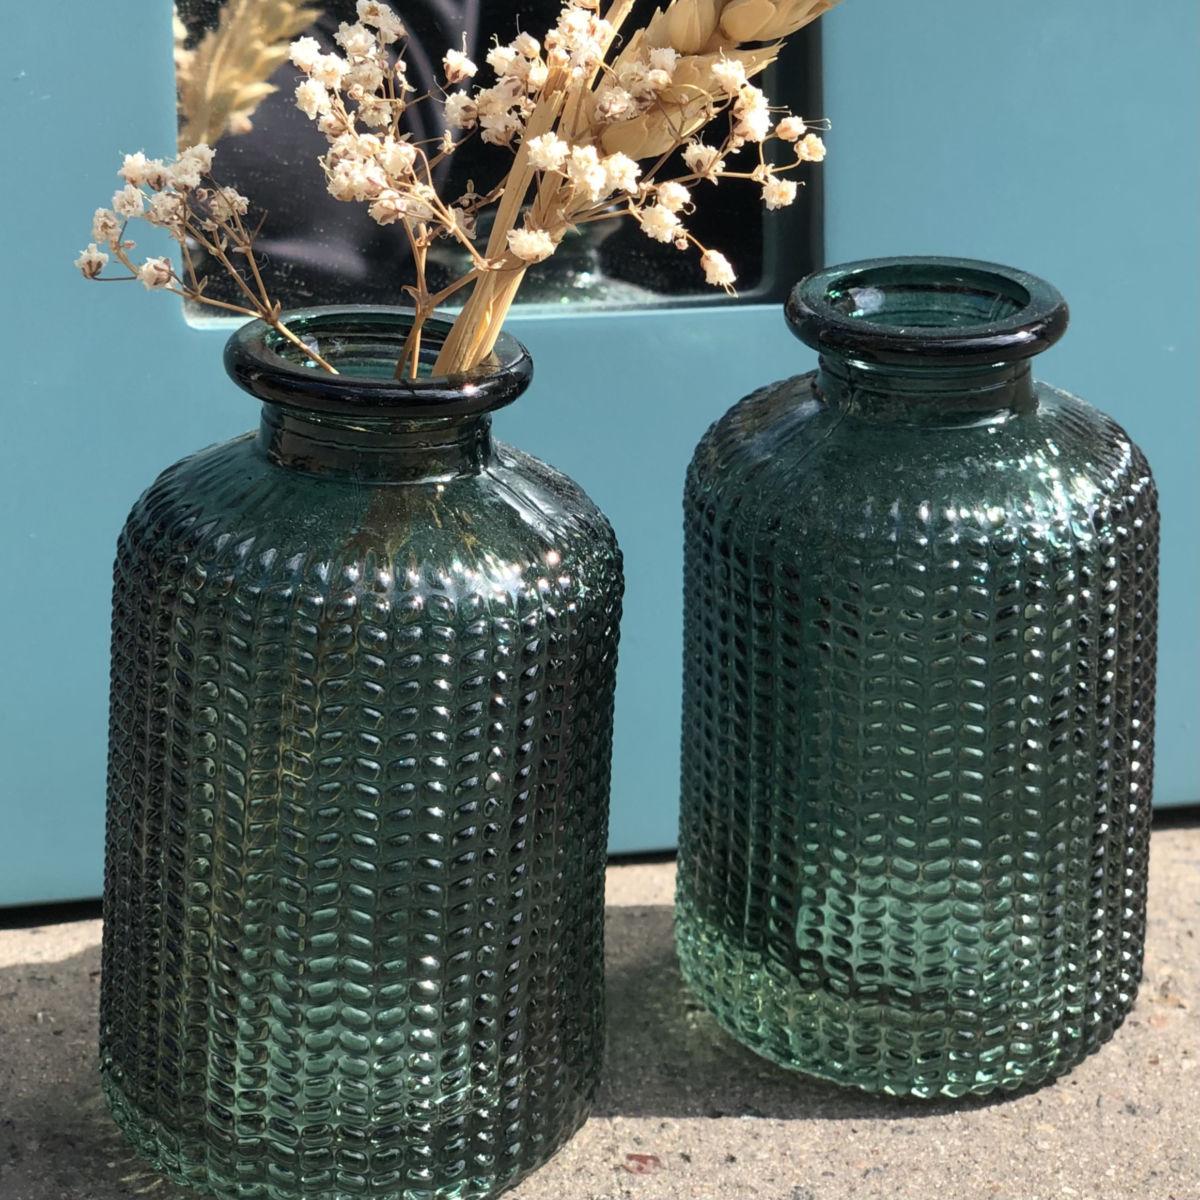 petite vase soliflore en verre vert by destele